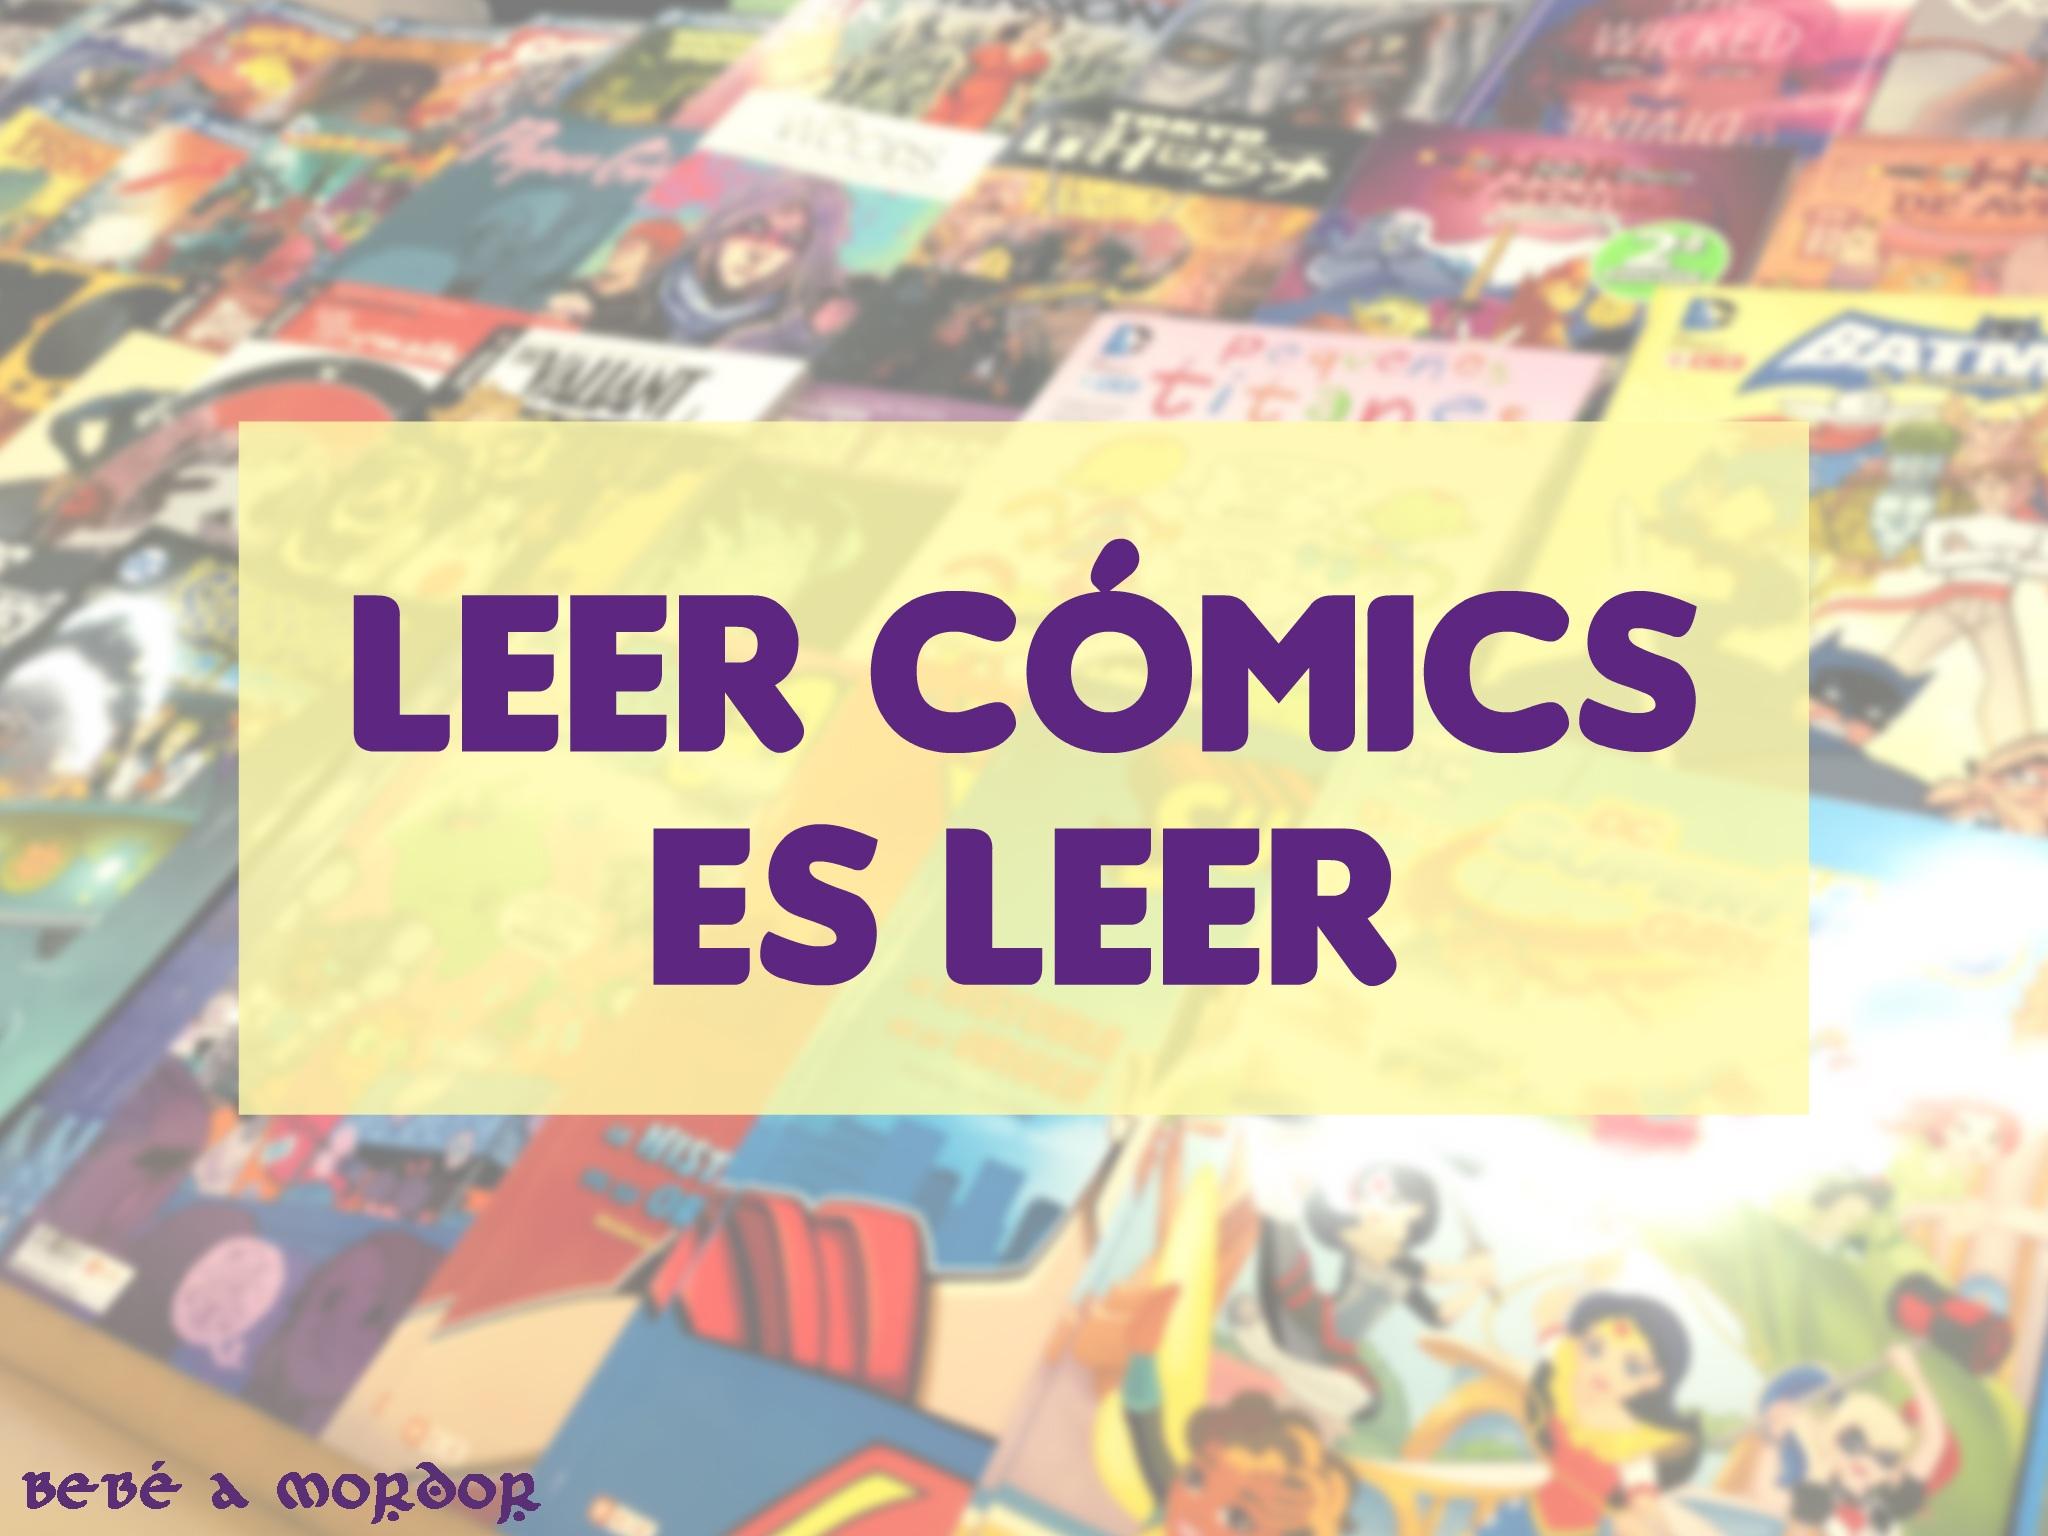 LeerCómicsEsLeer